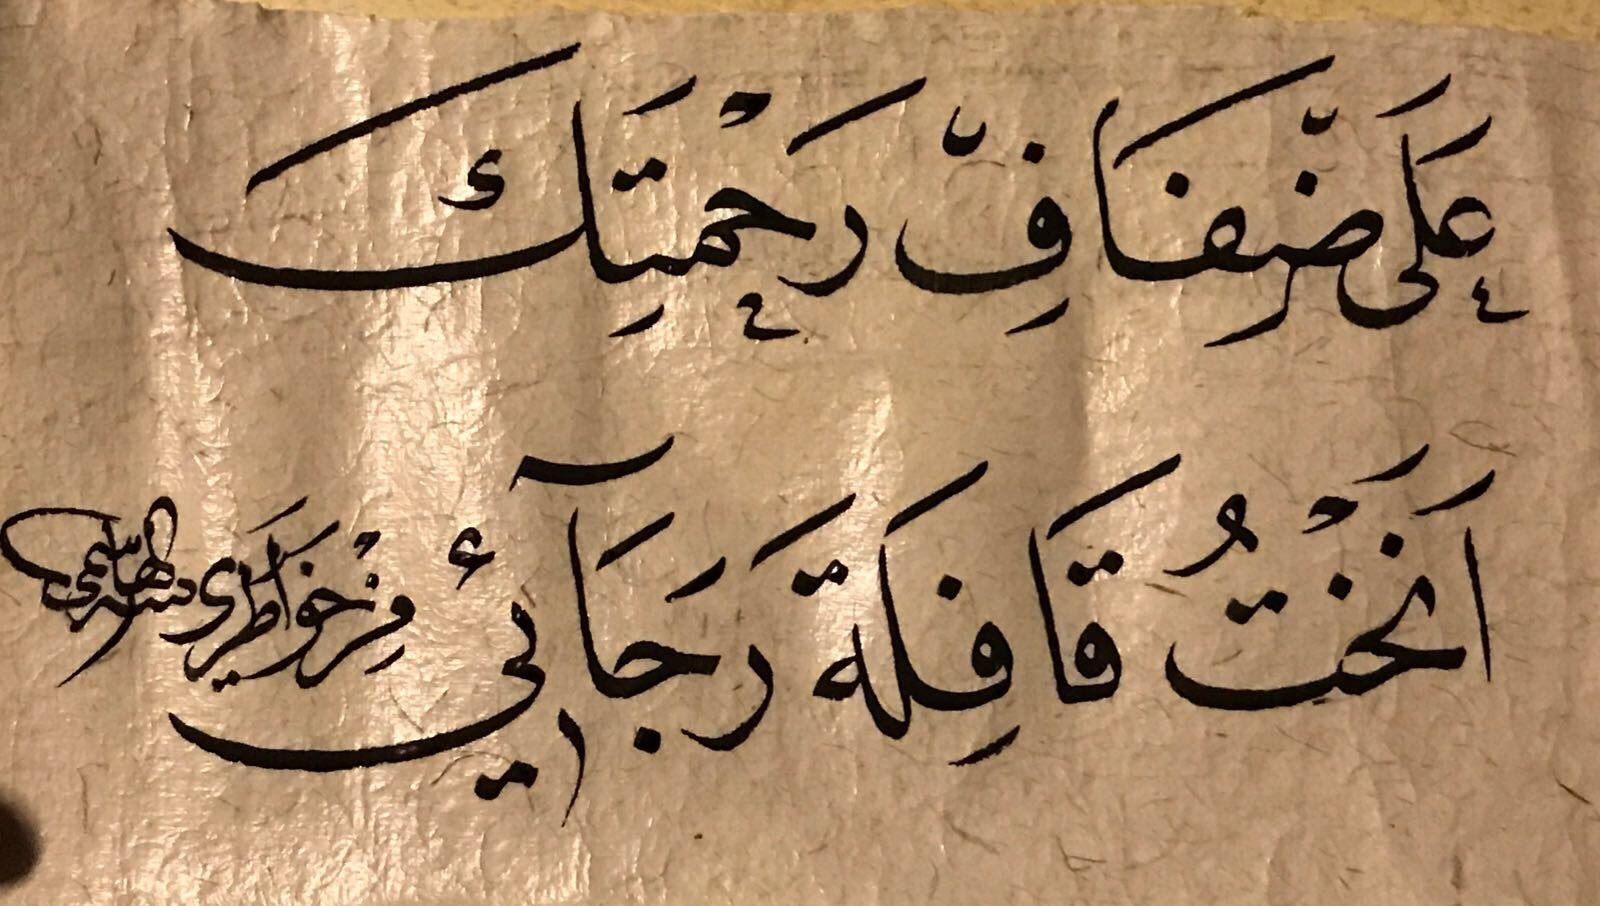 اللهم آمين لكل ما في قلبي و قلب من احب Picture Quotes Quotes Beautiful Quotes